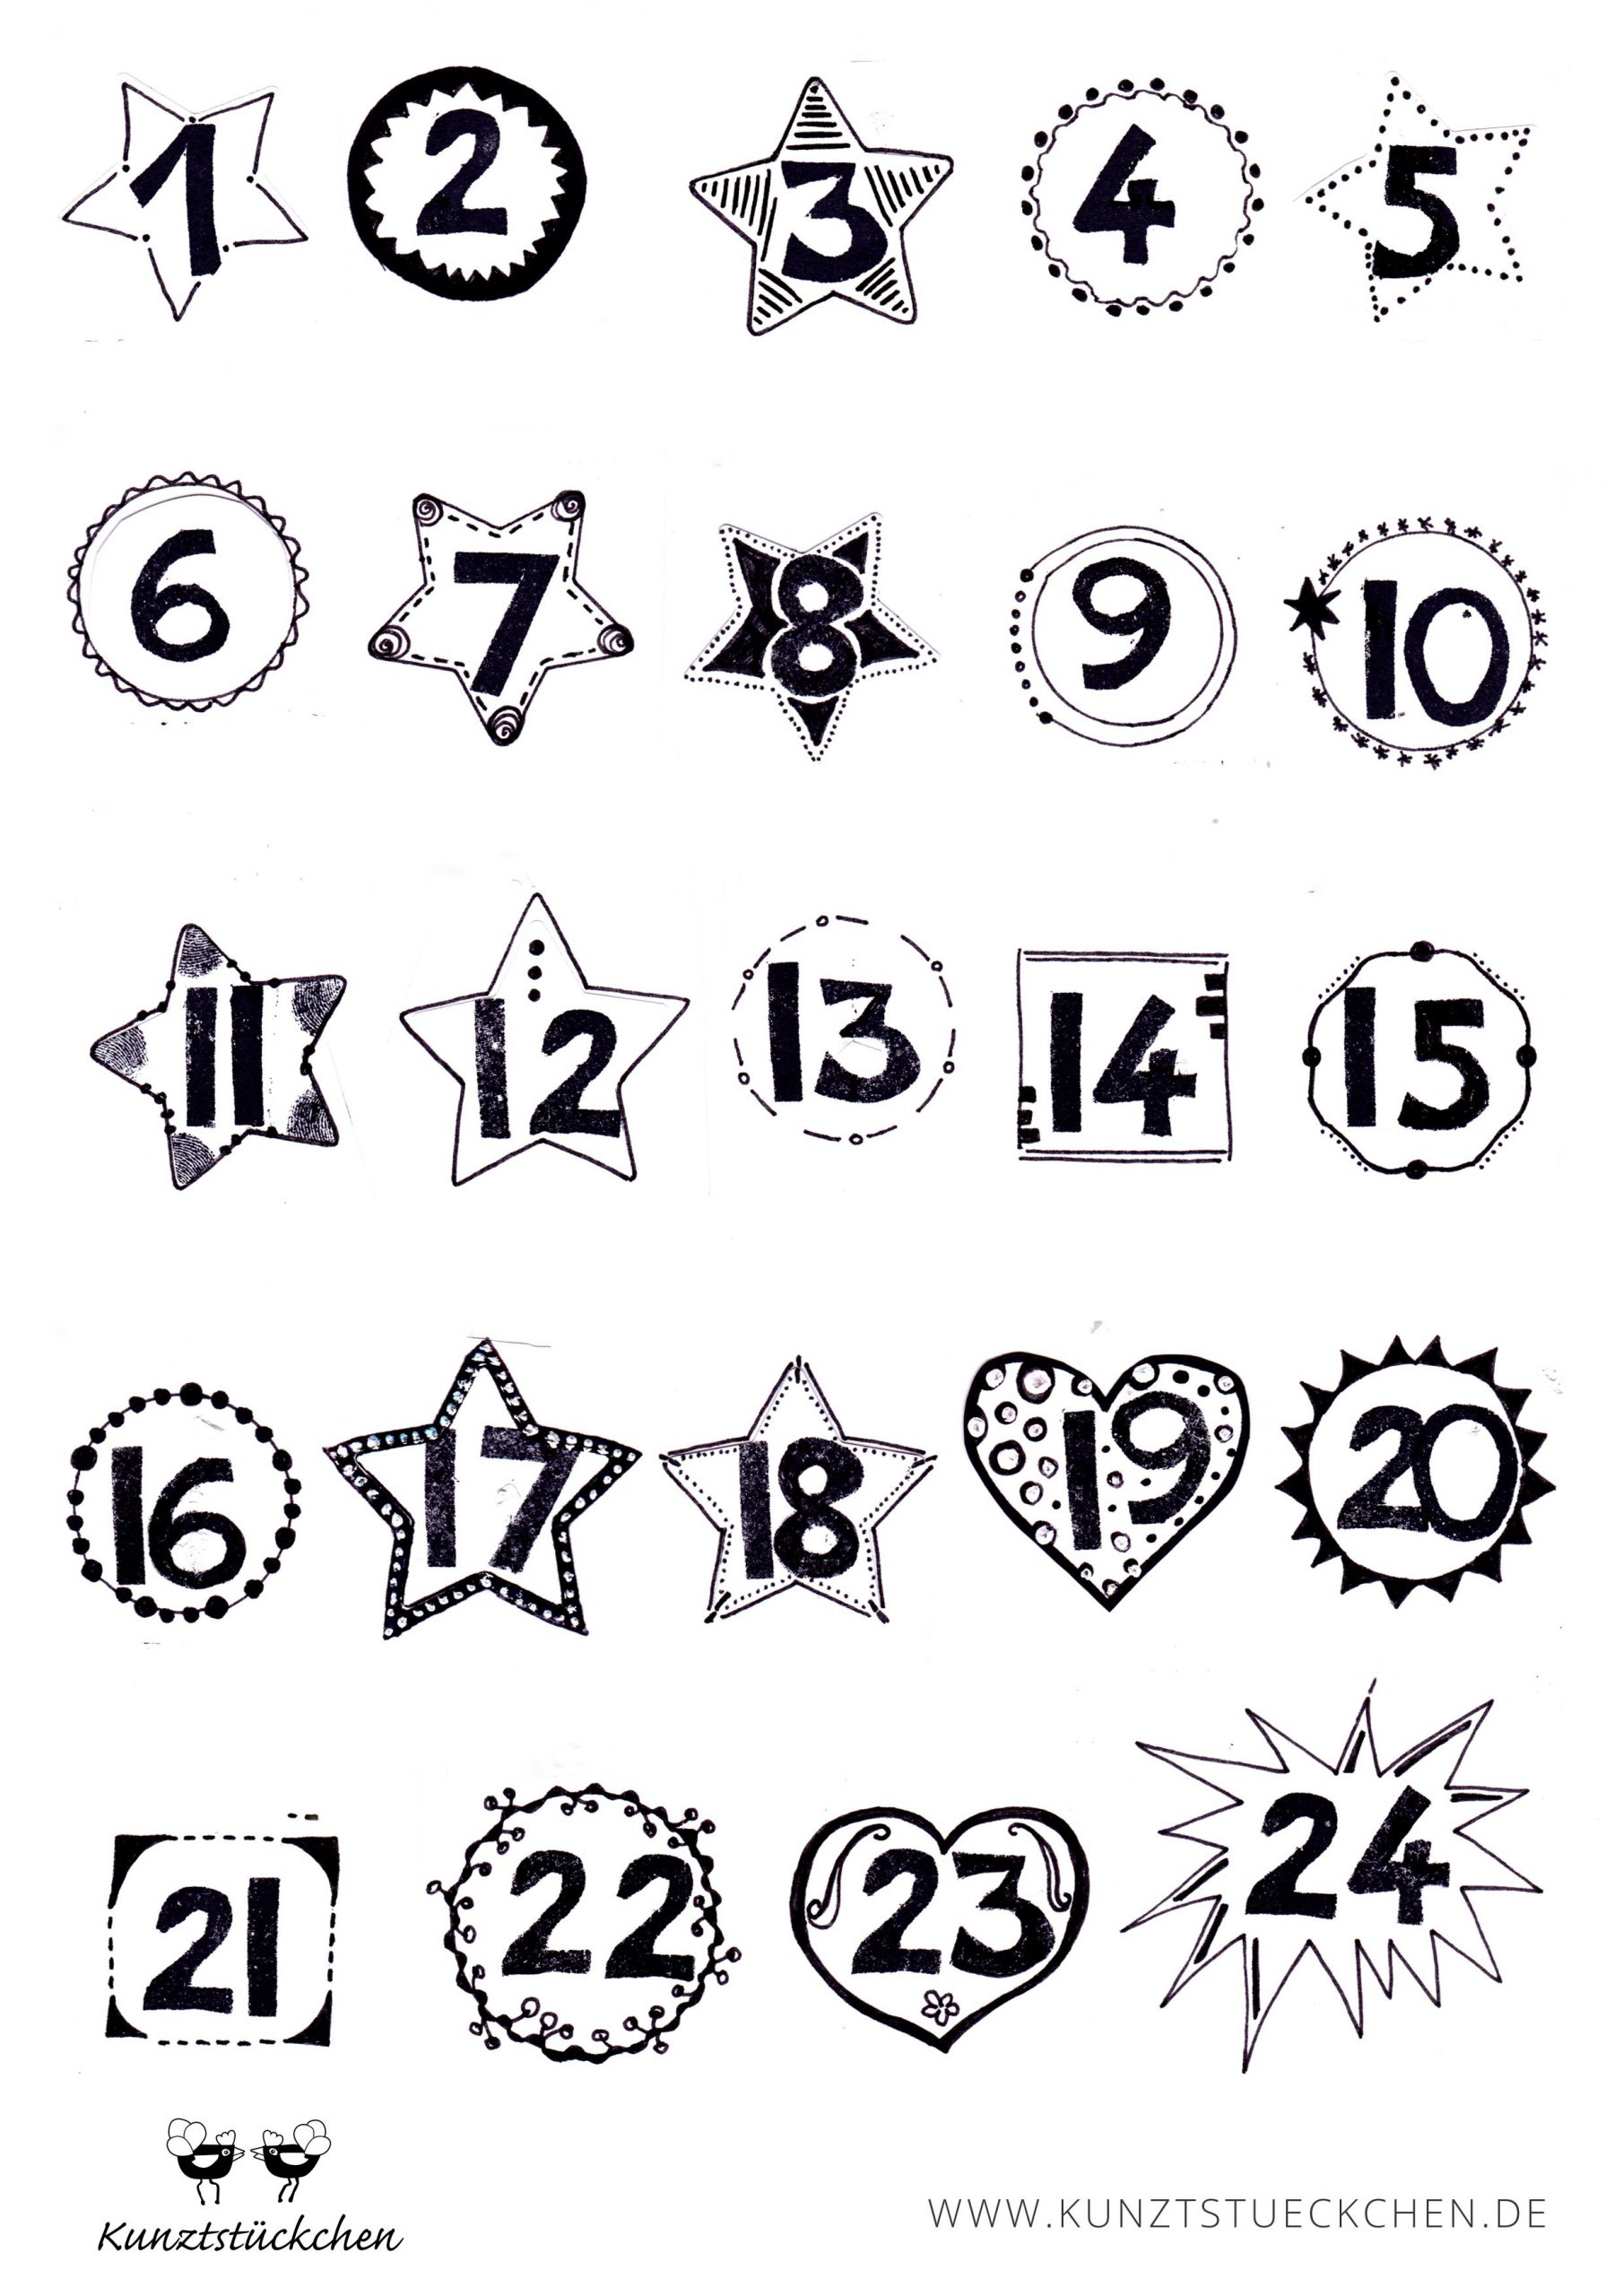 Adventskalender-Fabrik | Adventkalender, Adventskalender bestimmt für Adventskalender Drucken